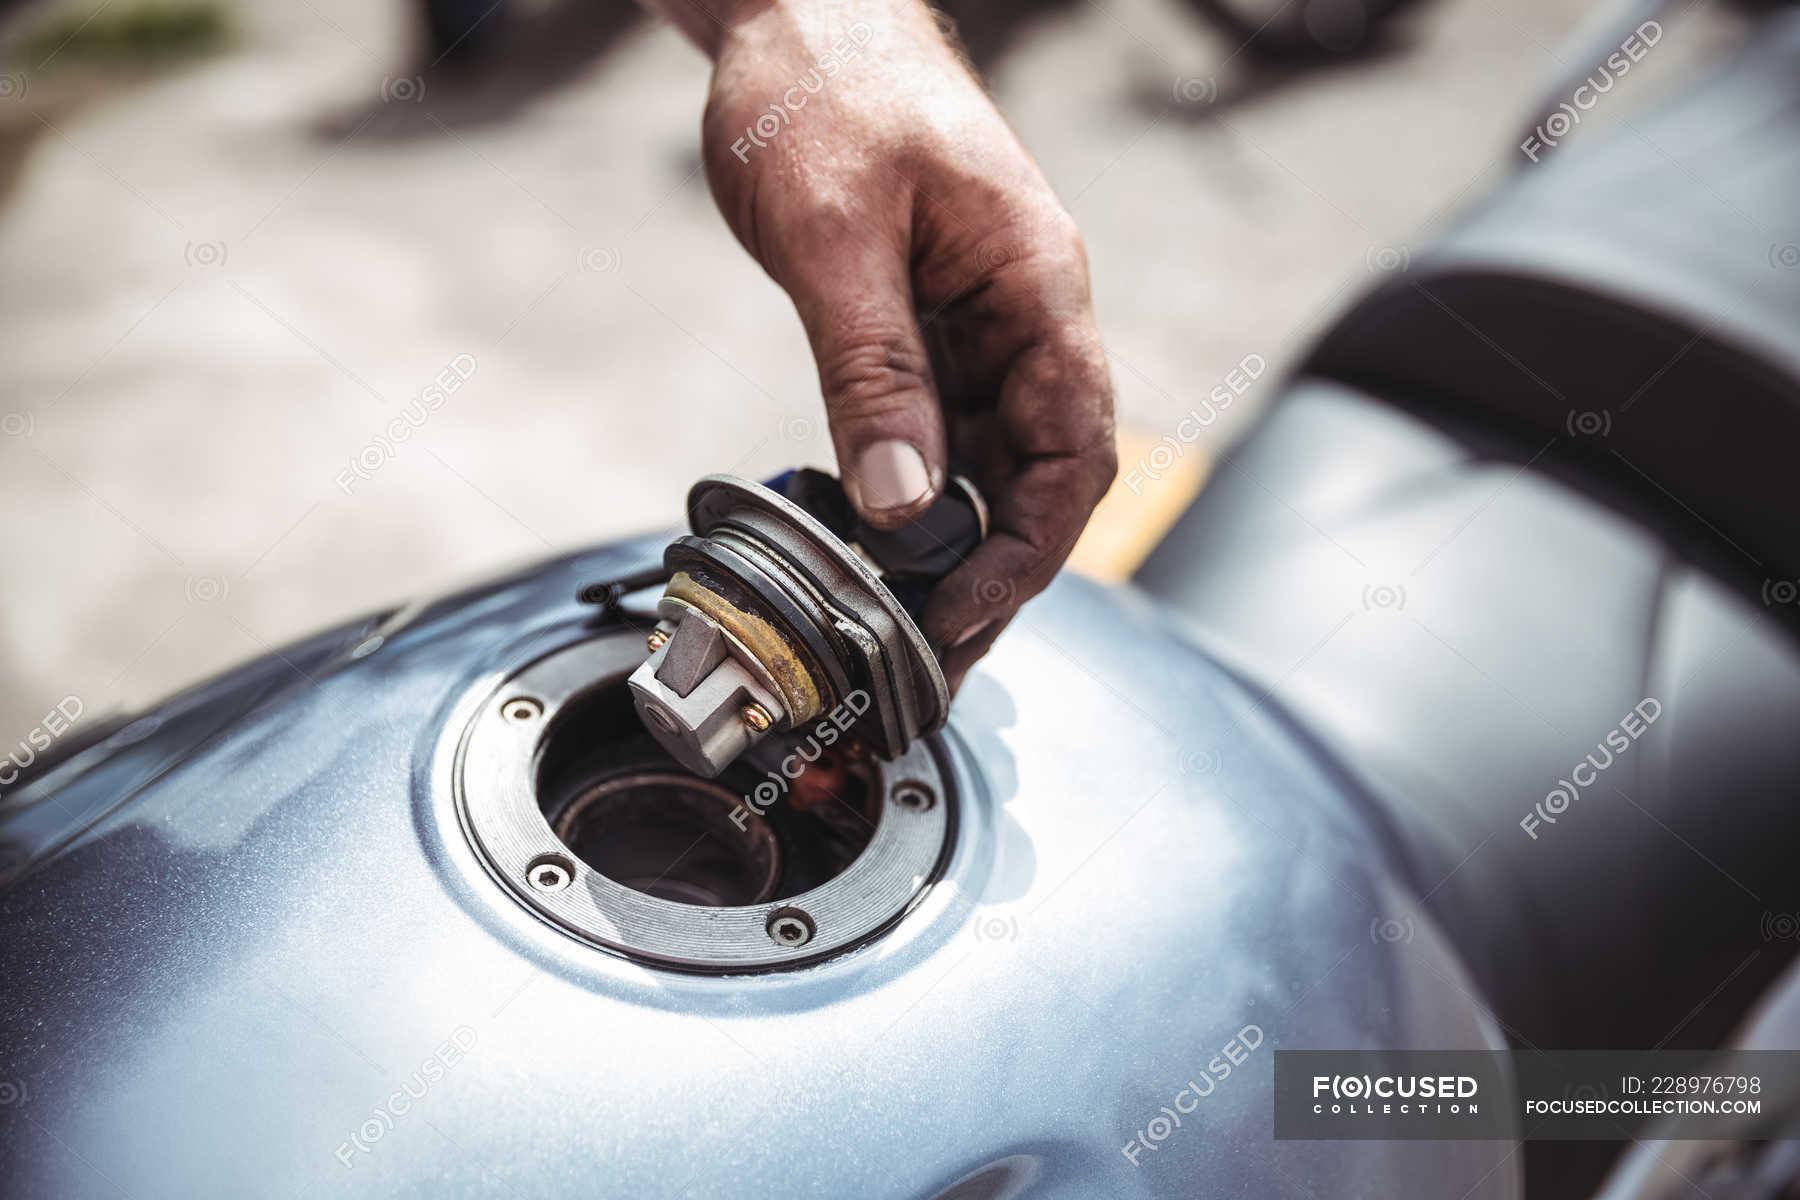 Hand of mechanic opening fuel tank of motor bike at workshop